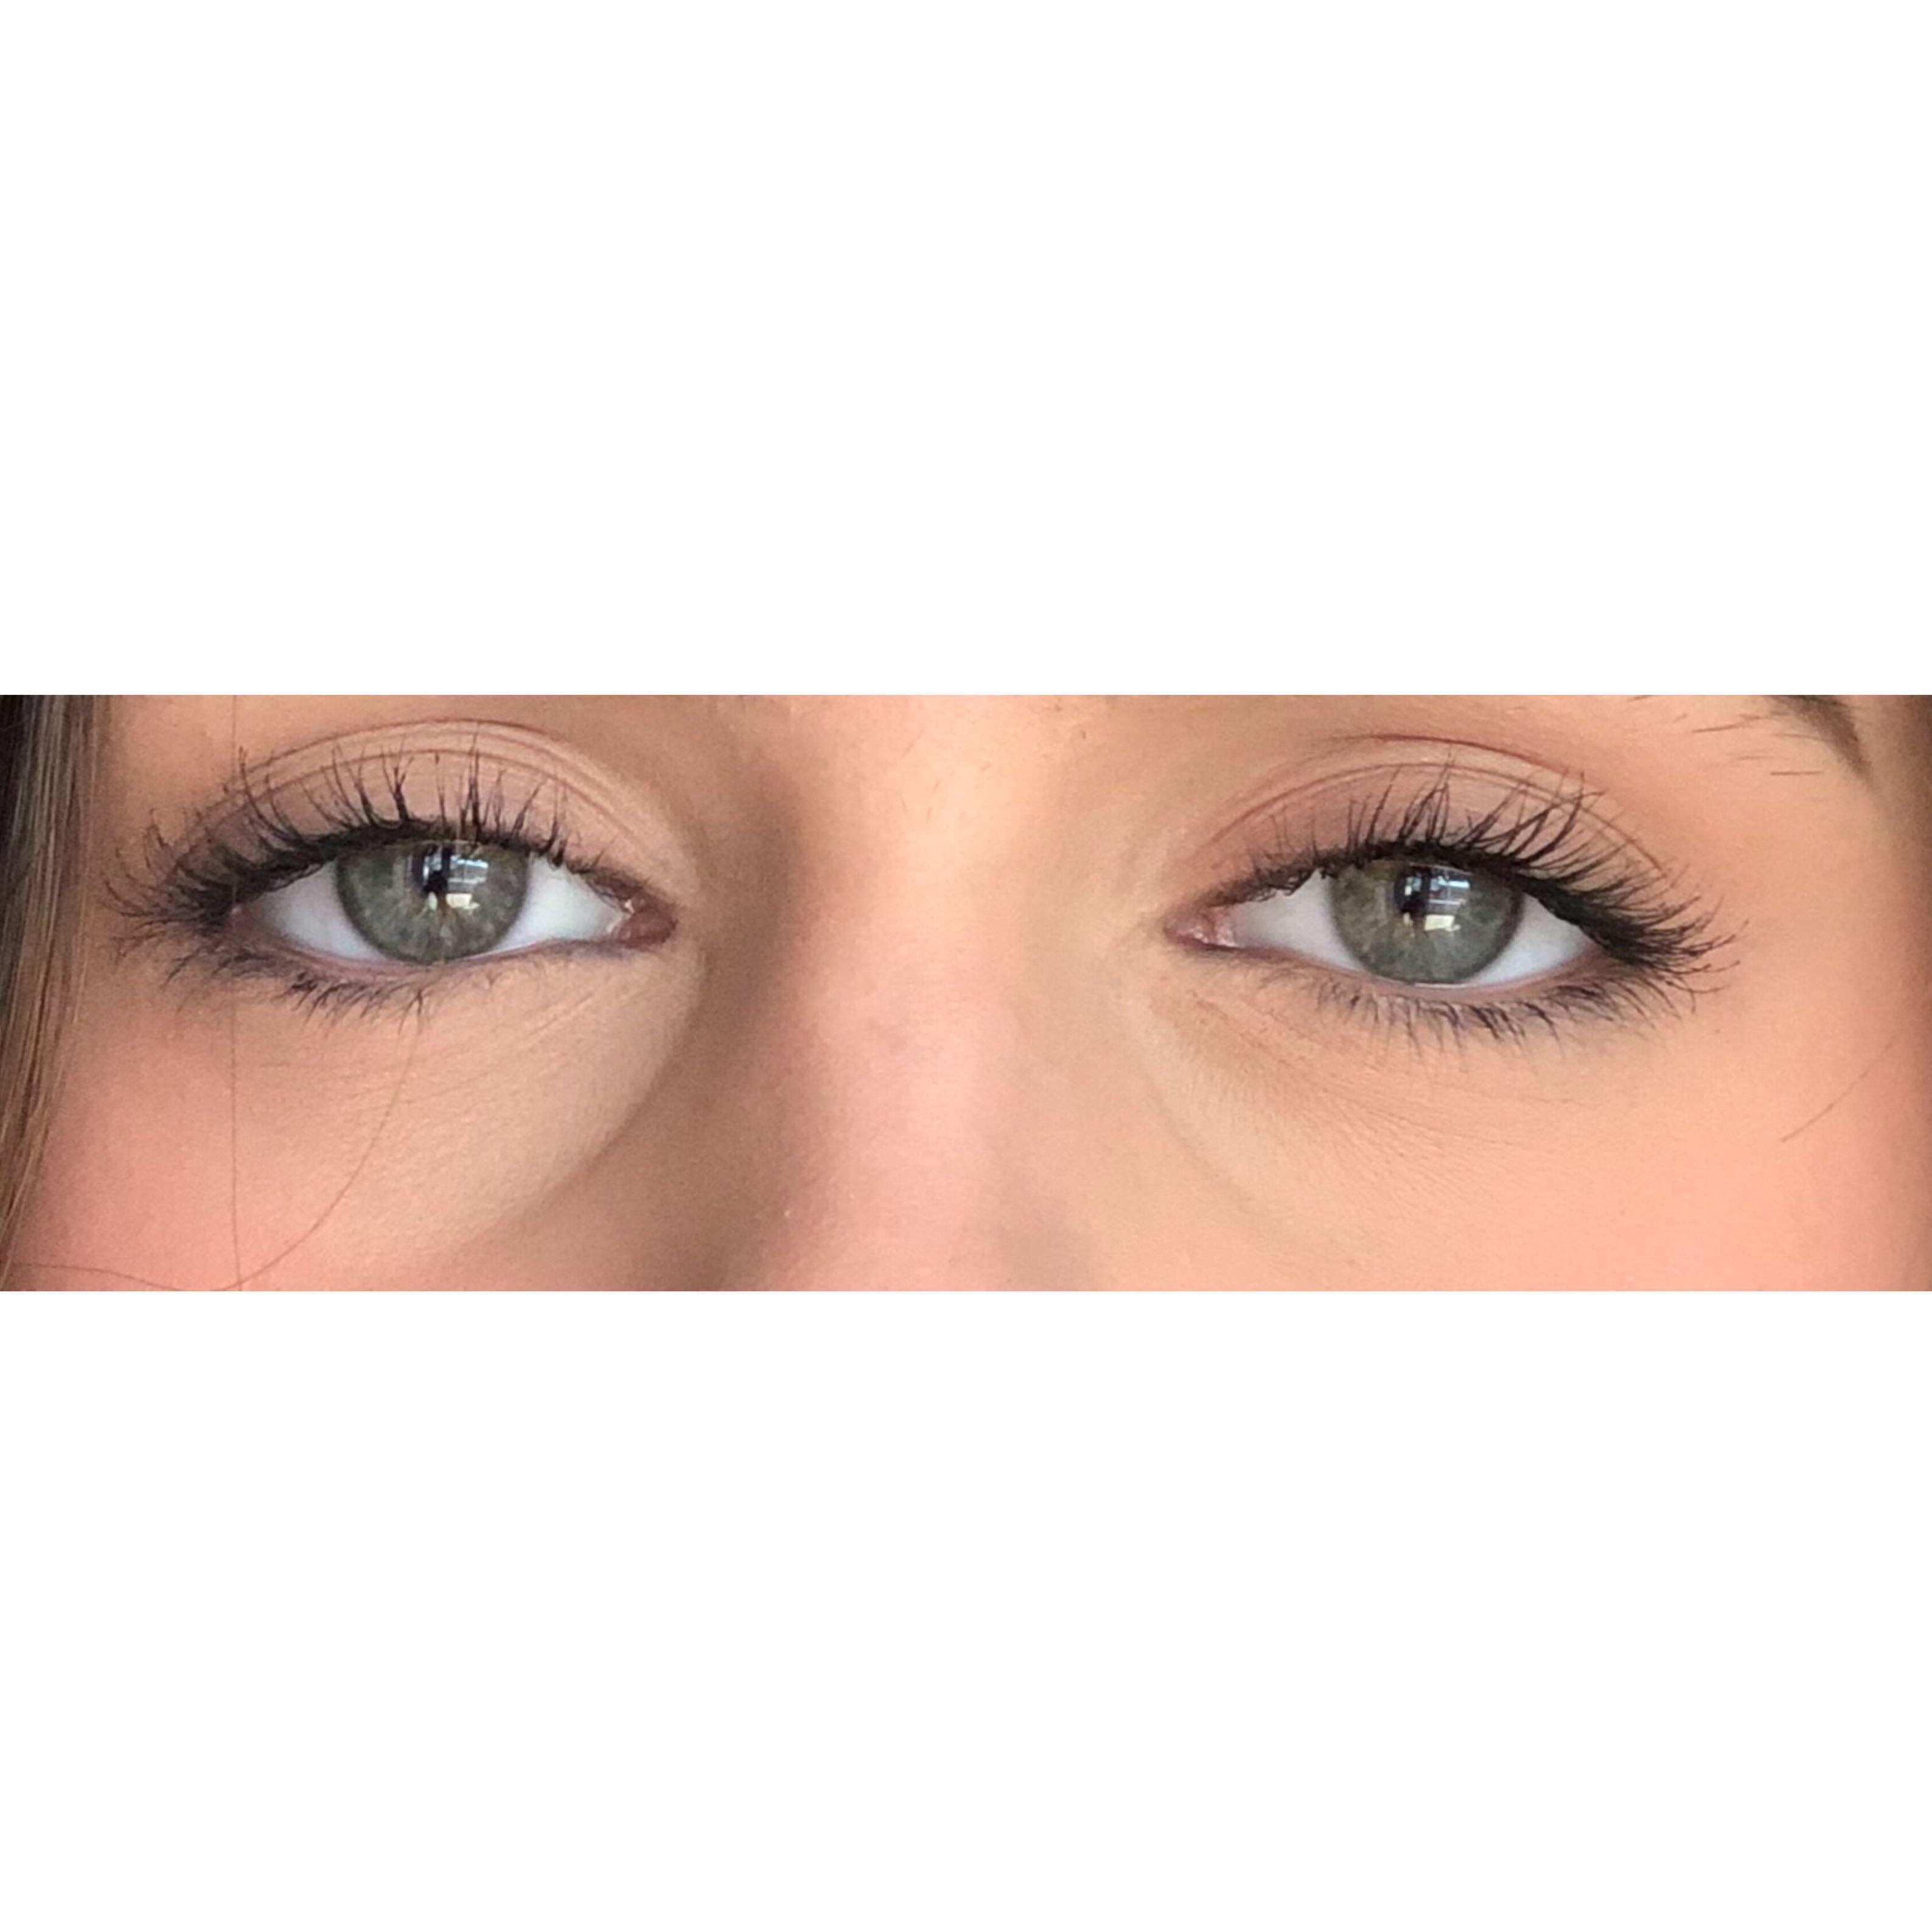 Tiefe Augenringe